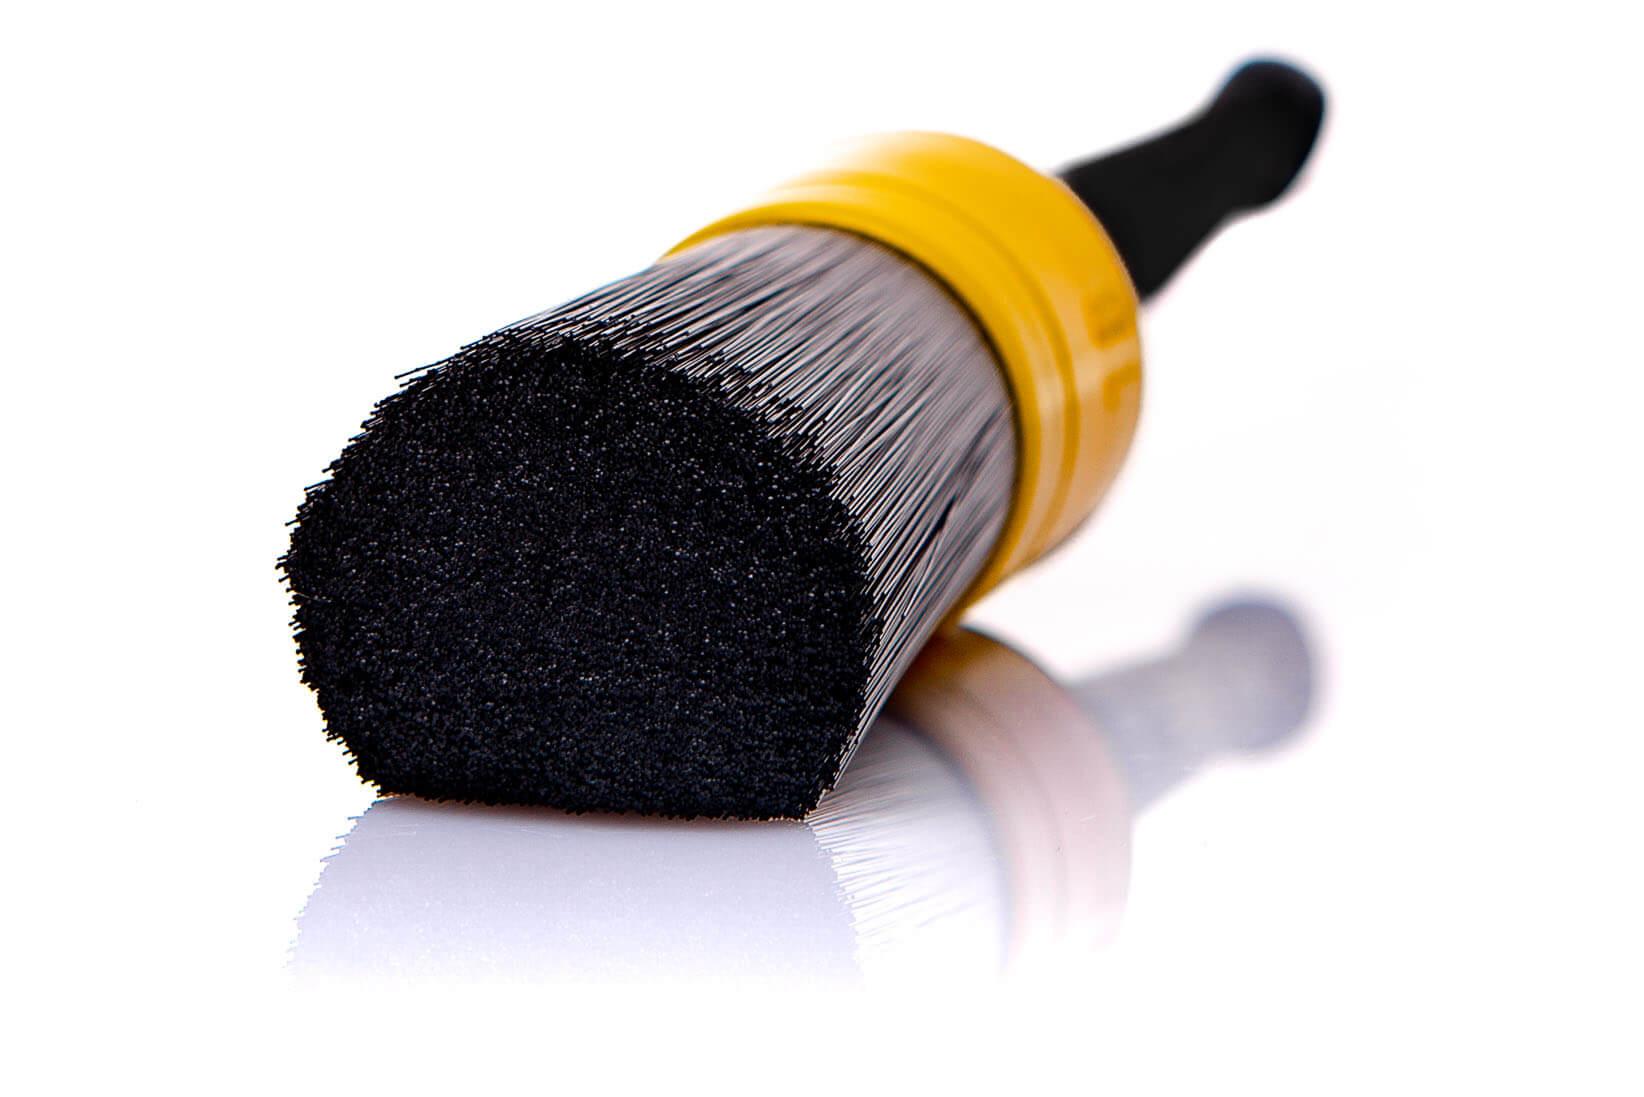 WORK STUFF Detailing Brush Black Stiff bristles